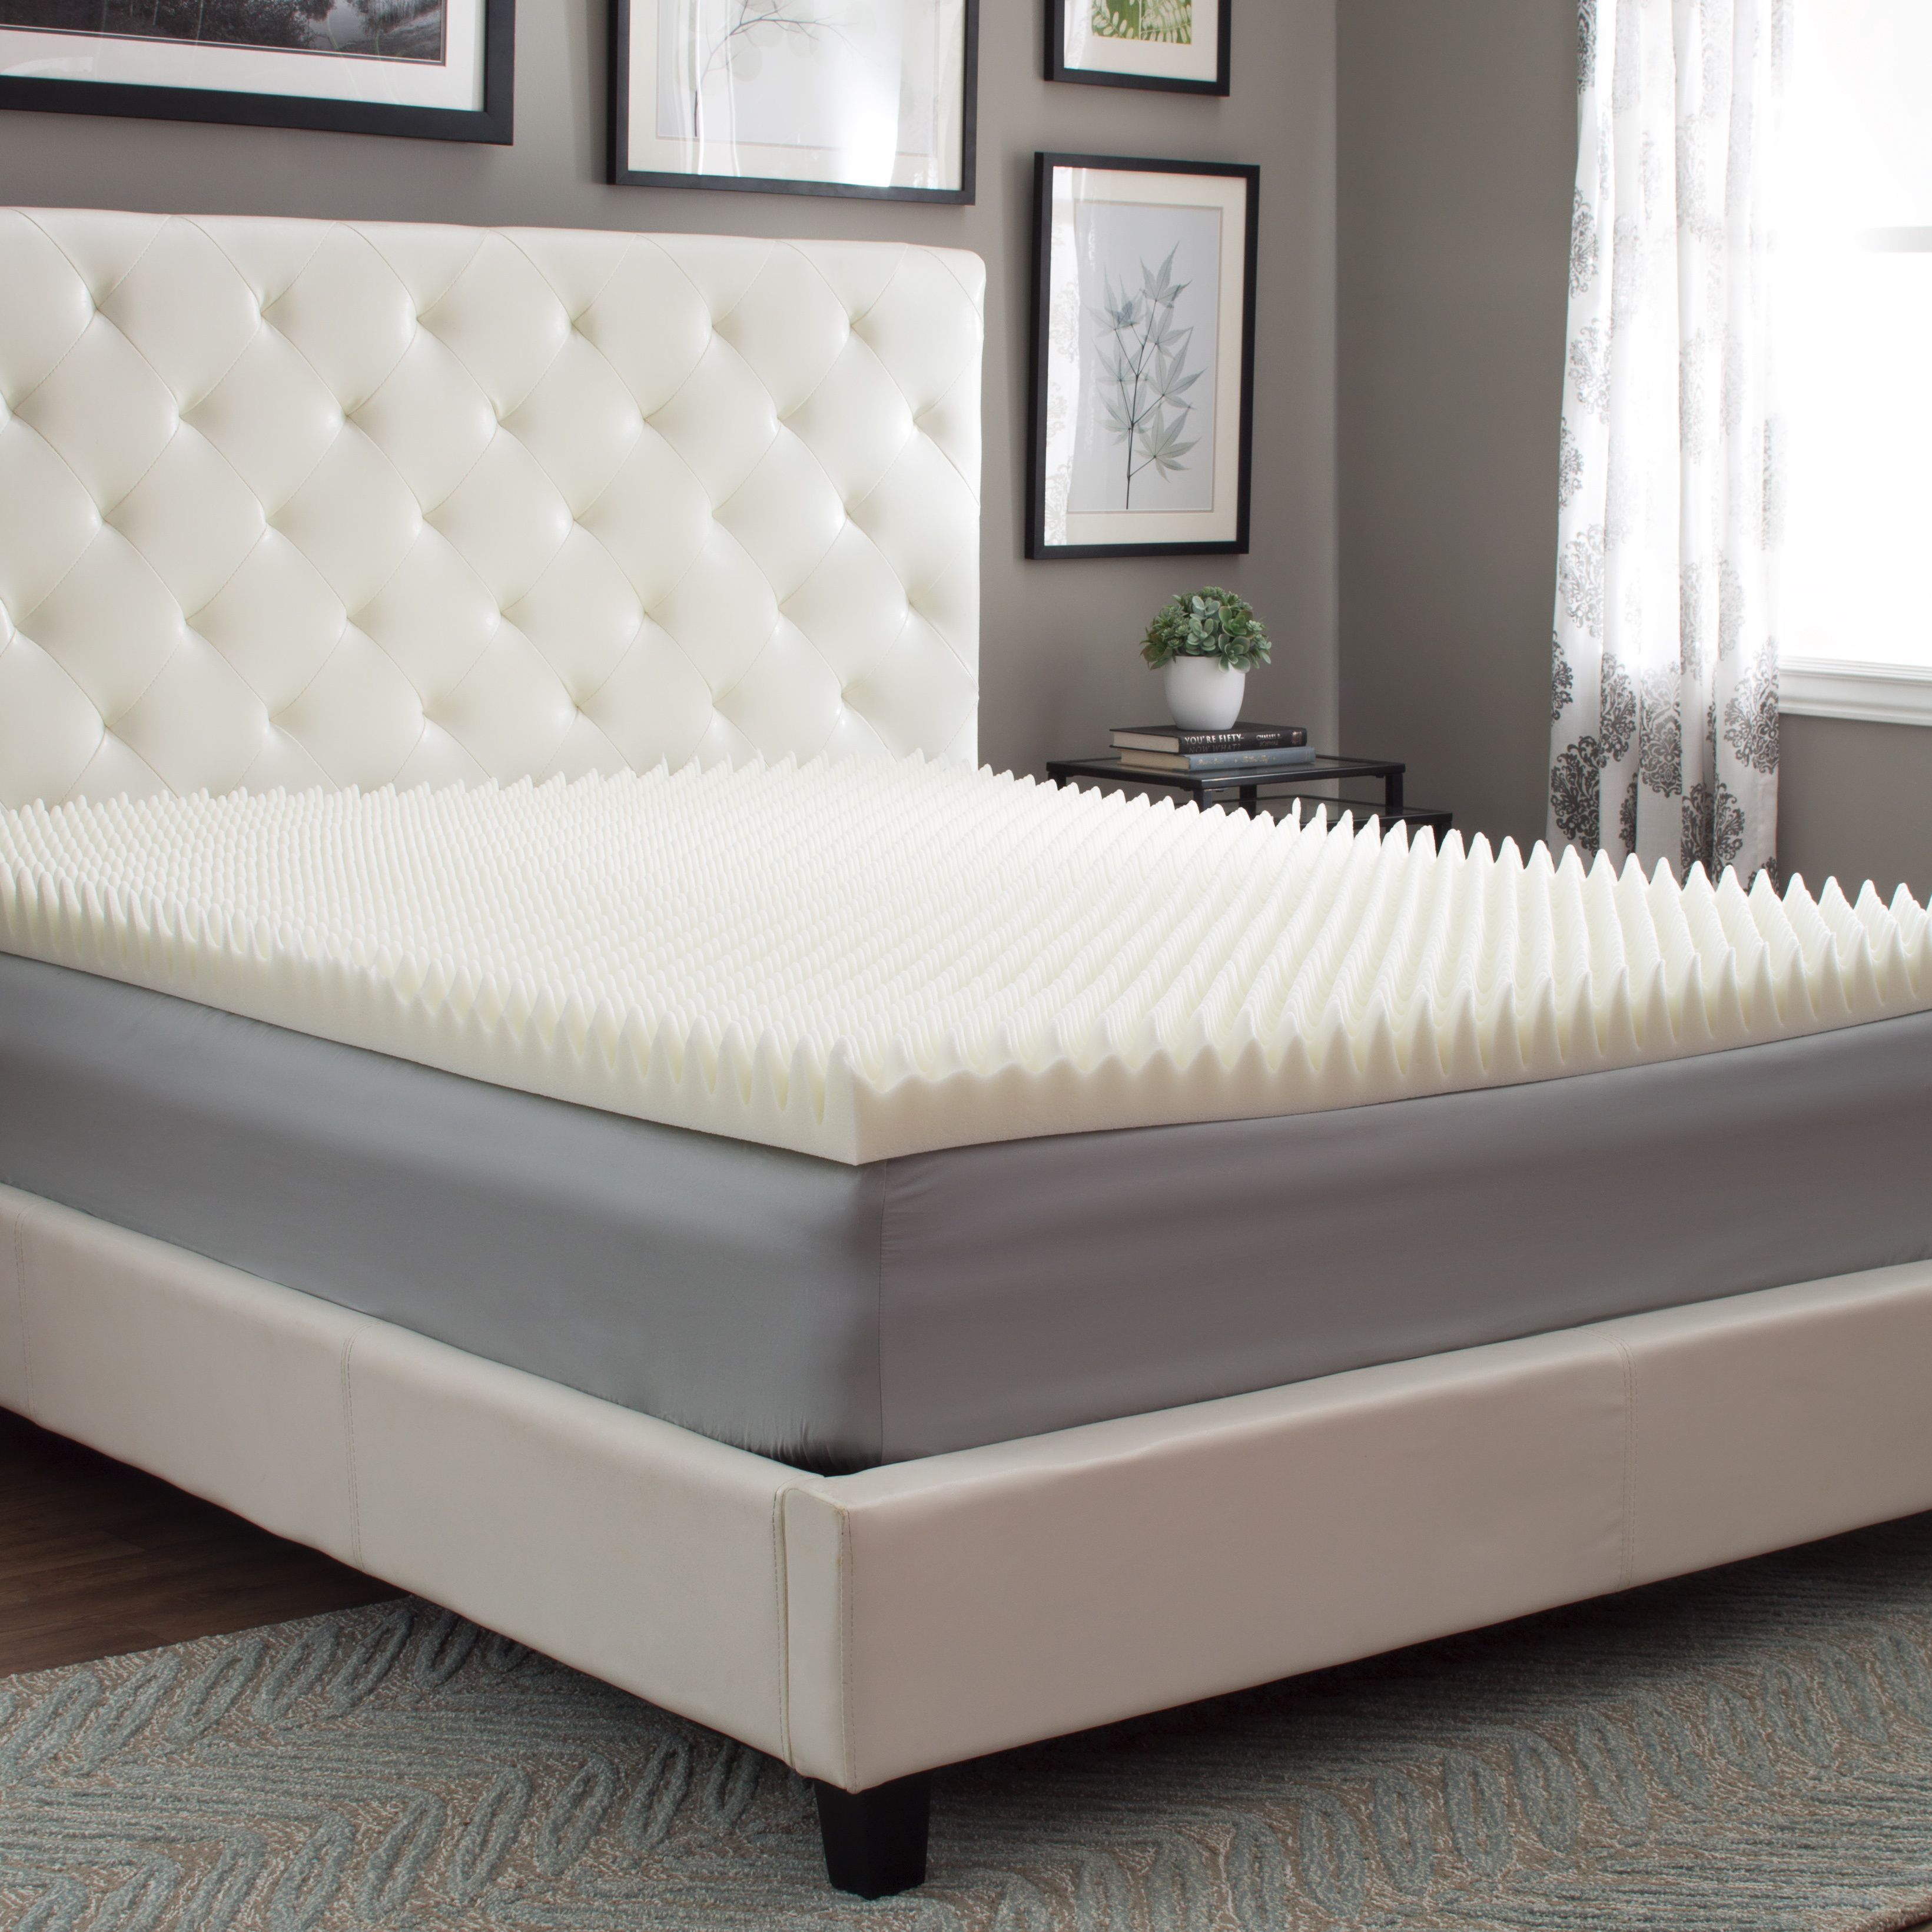 Slumber Solutions Highloft Supreme 4 Inch Memory Foam Mattress